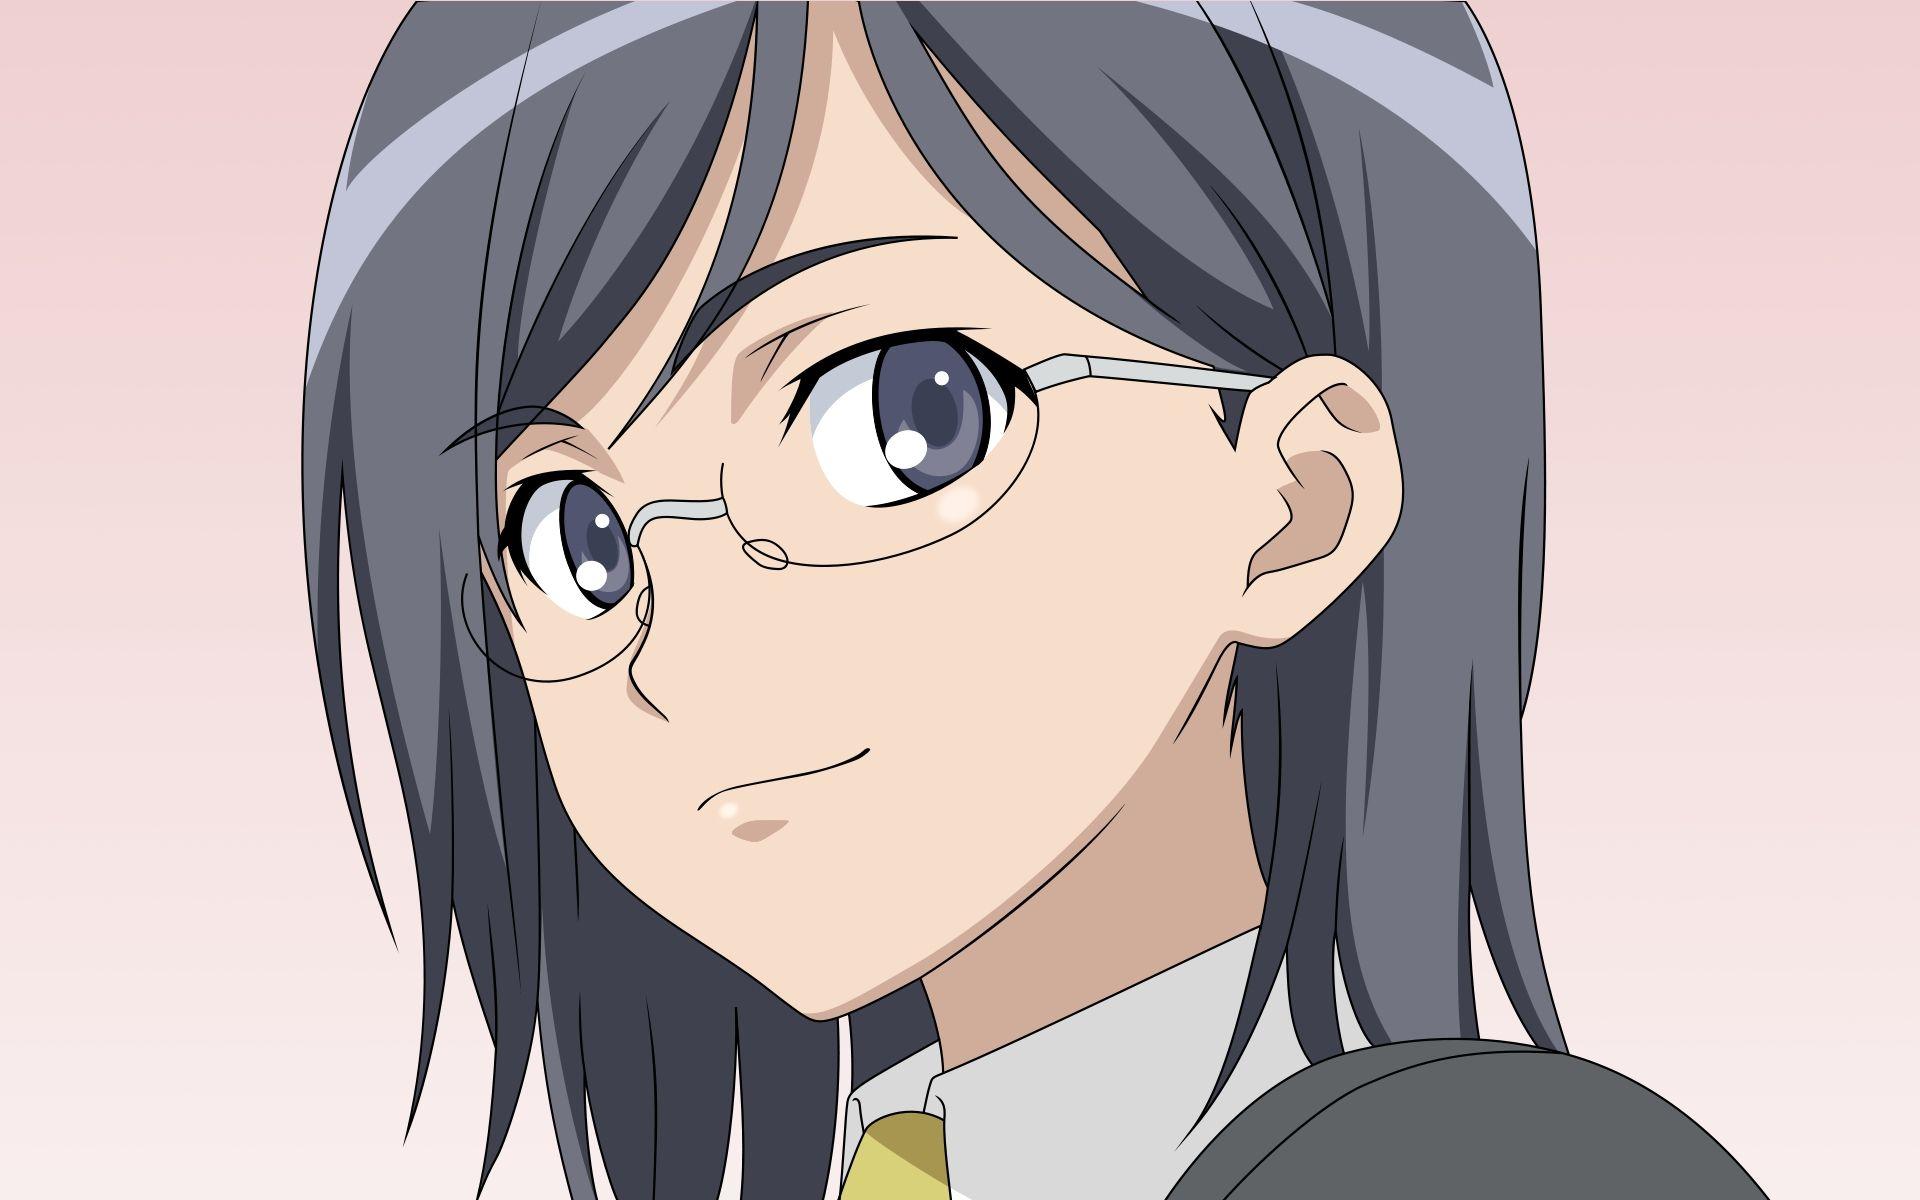 Mii Konori (A Certain Scientific Railgun) Trina